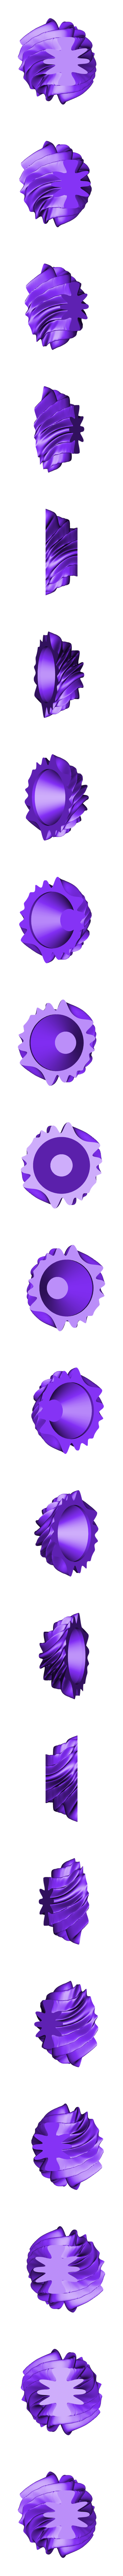 ORGANIC_BOX_B.stl Download free STL file Organic Box • 3D printer object, BEEVERYCREATIVE